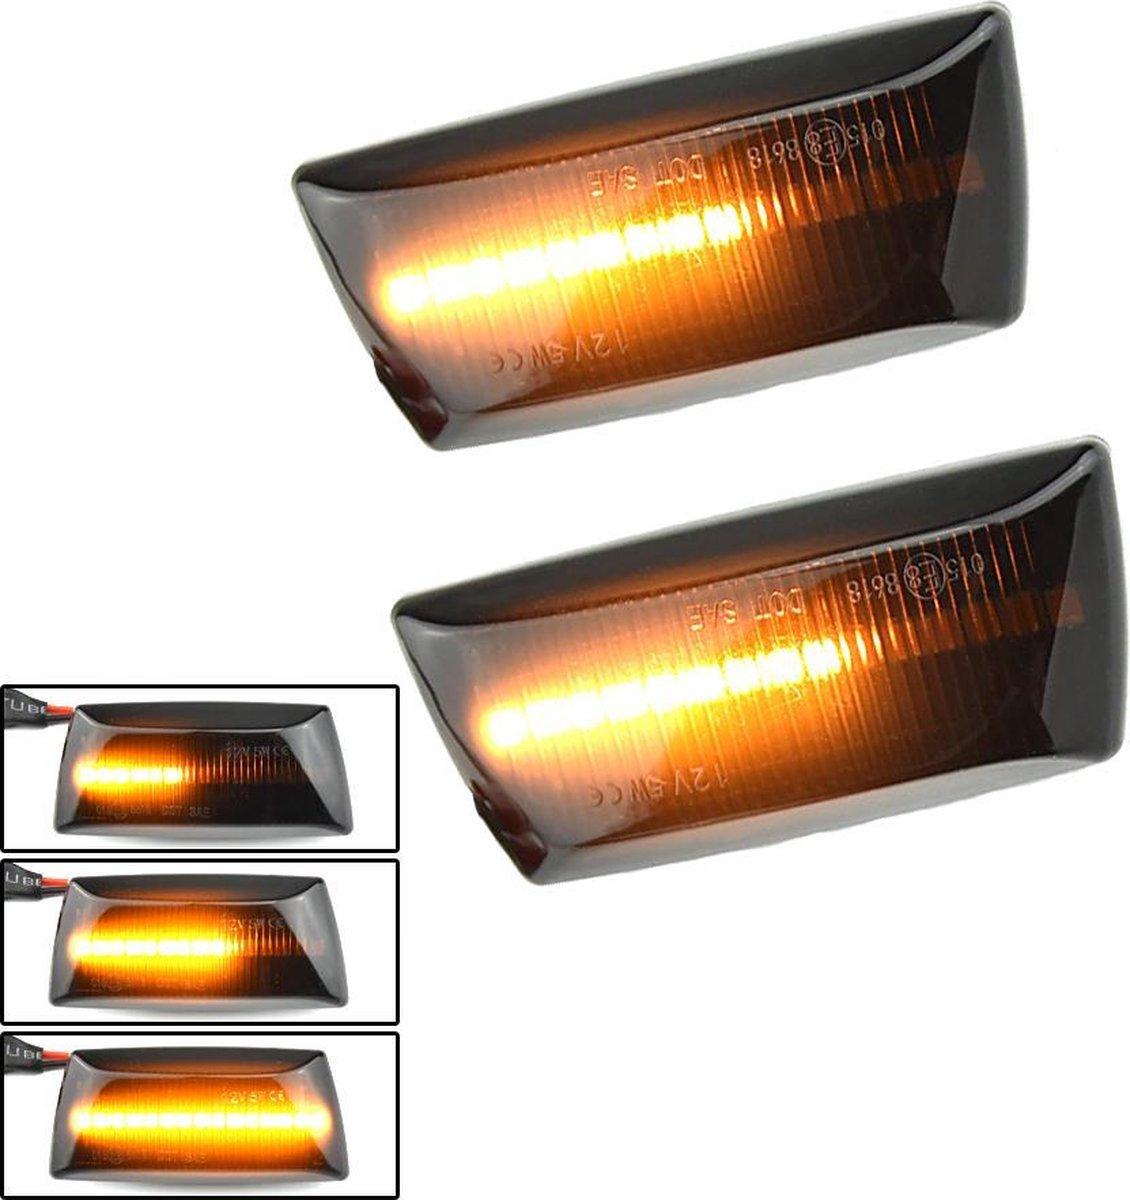 Xarang Autolampen - LED Dynamic Zijknipperlichten - voor Opel Astra H Zafira B Corsa D Insignia Meri